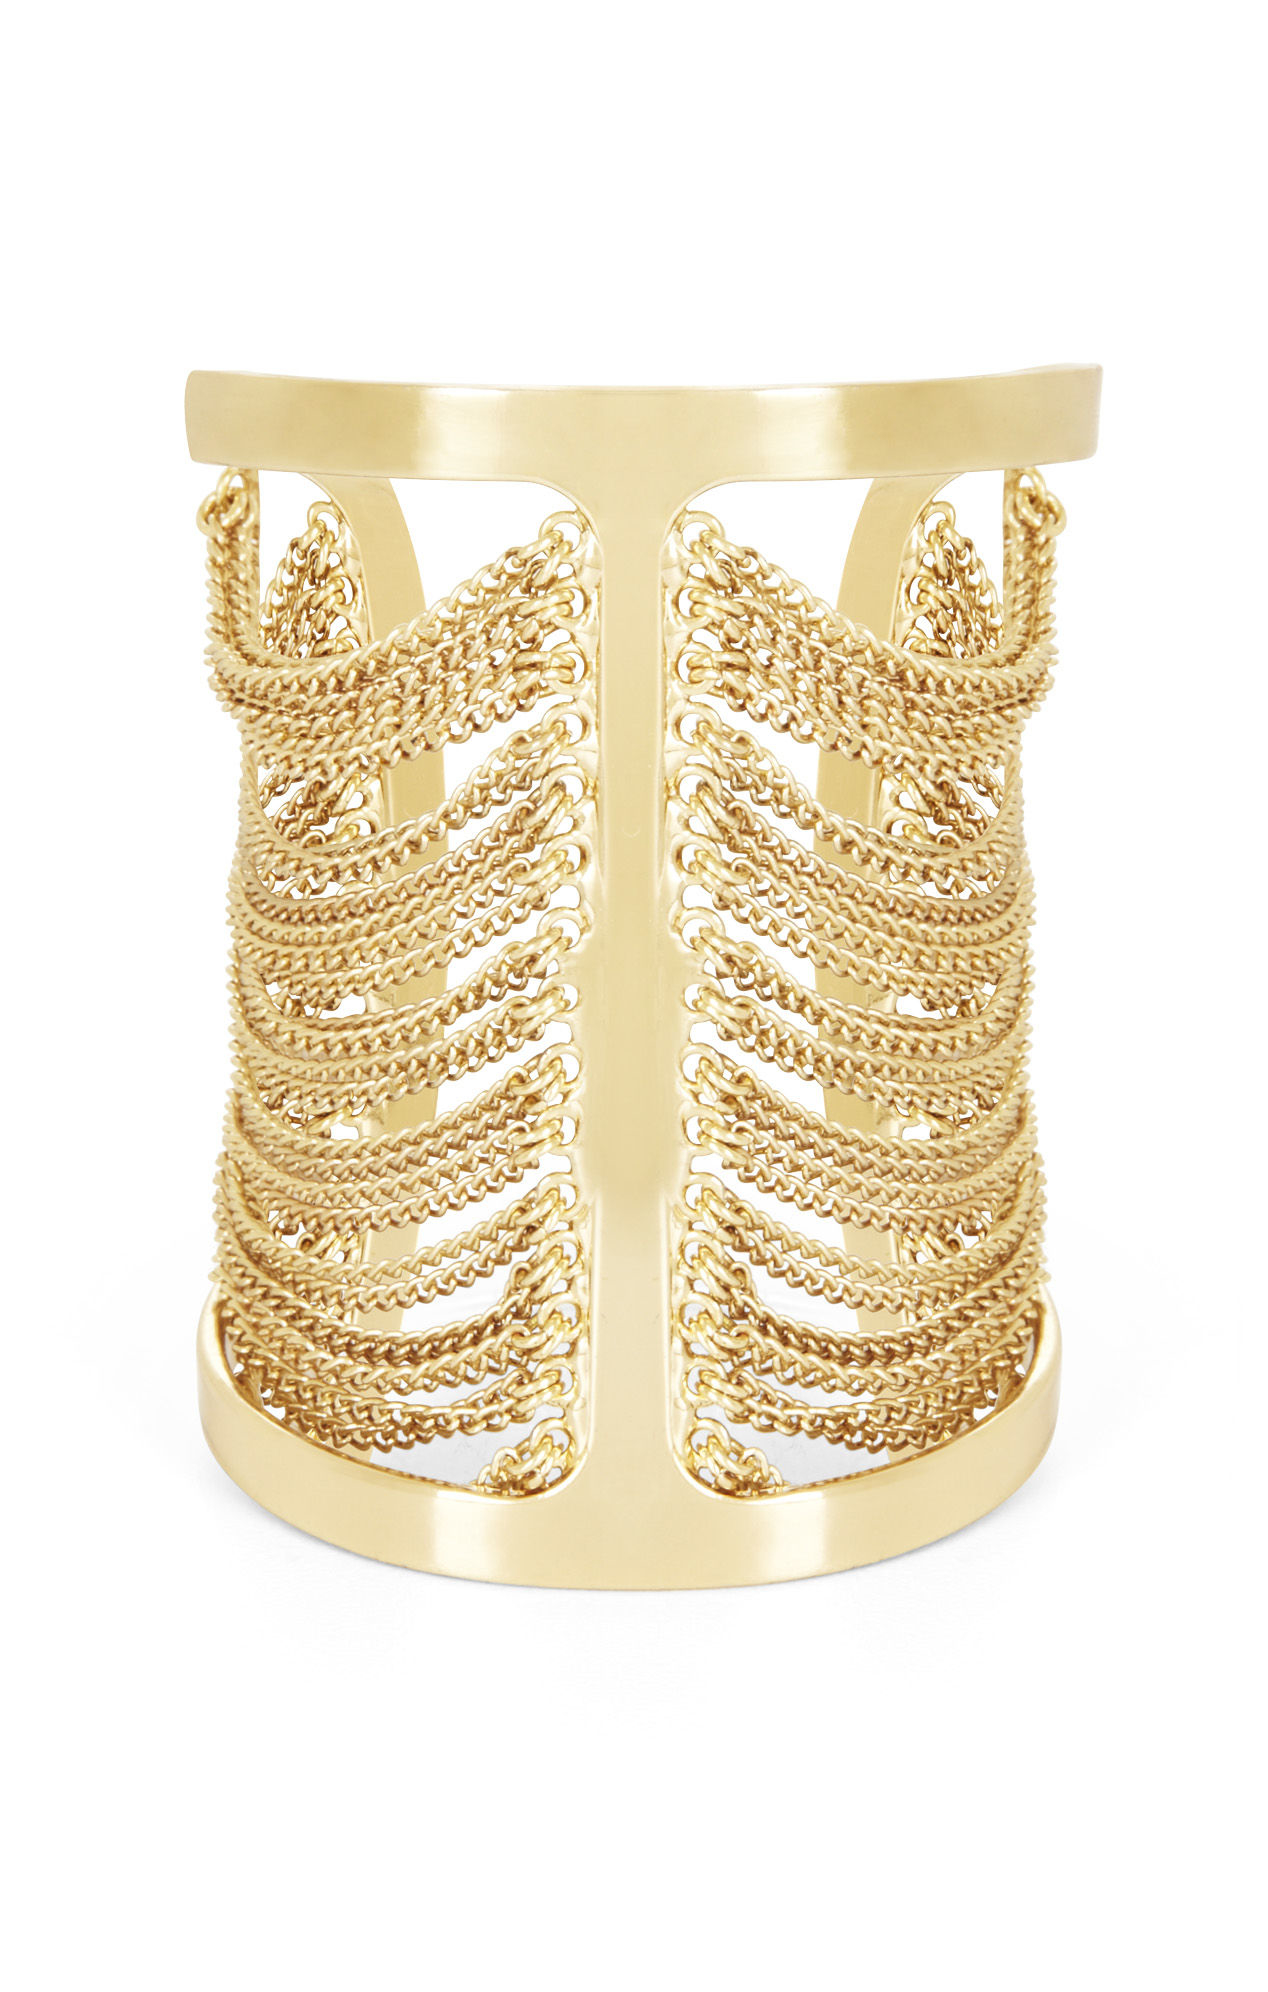 Sole Society Womens Statement Cuff Bracelet Gold One Size From Sole Society Ony7Y1U